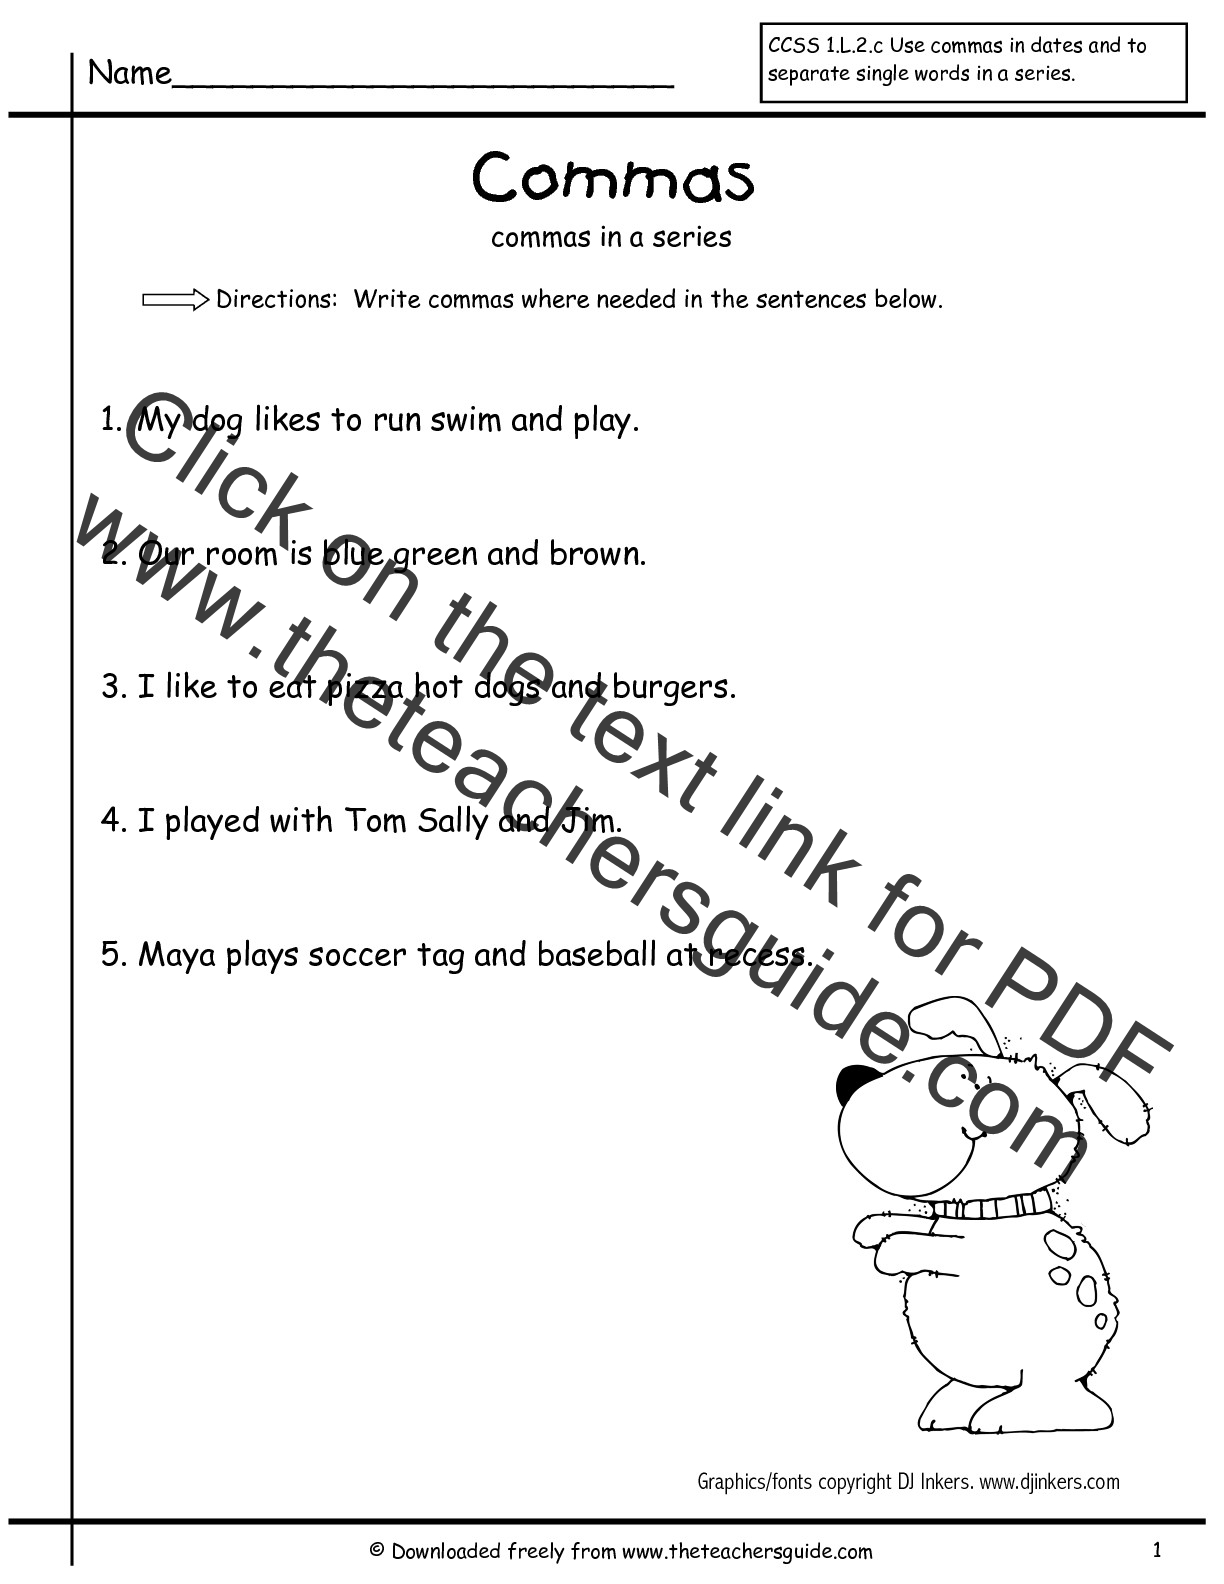 Using Commas In A Series Worksheet